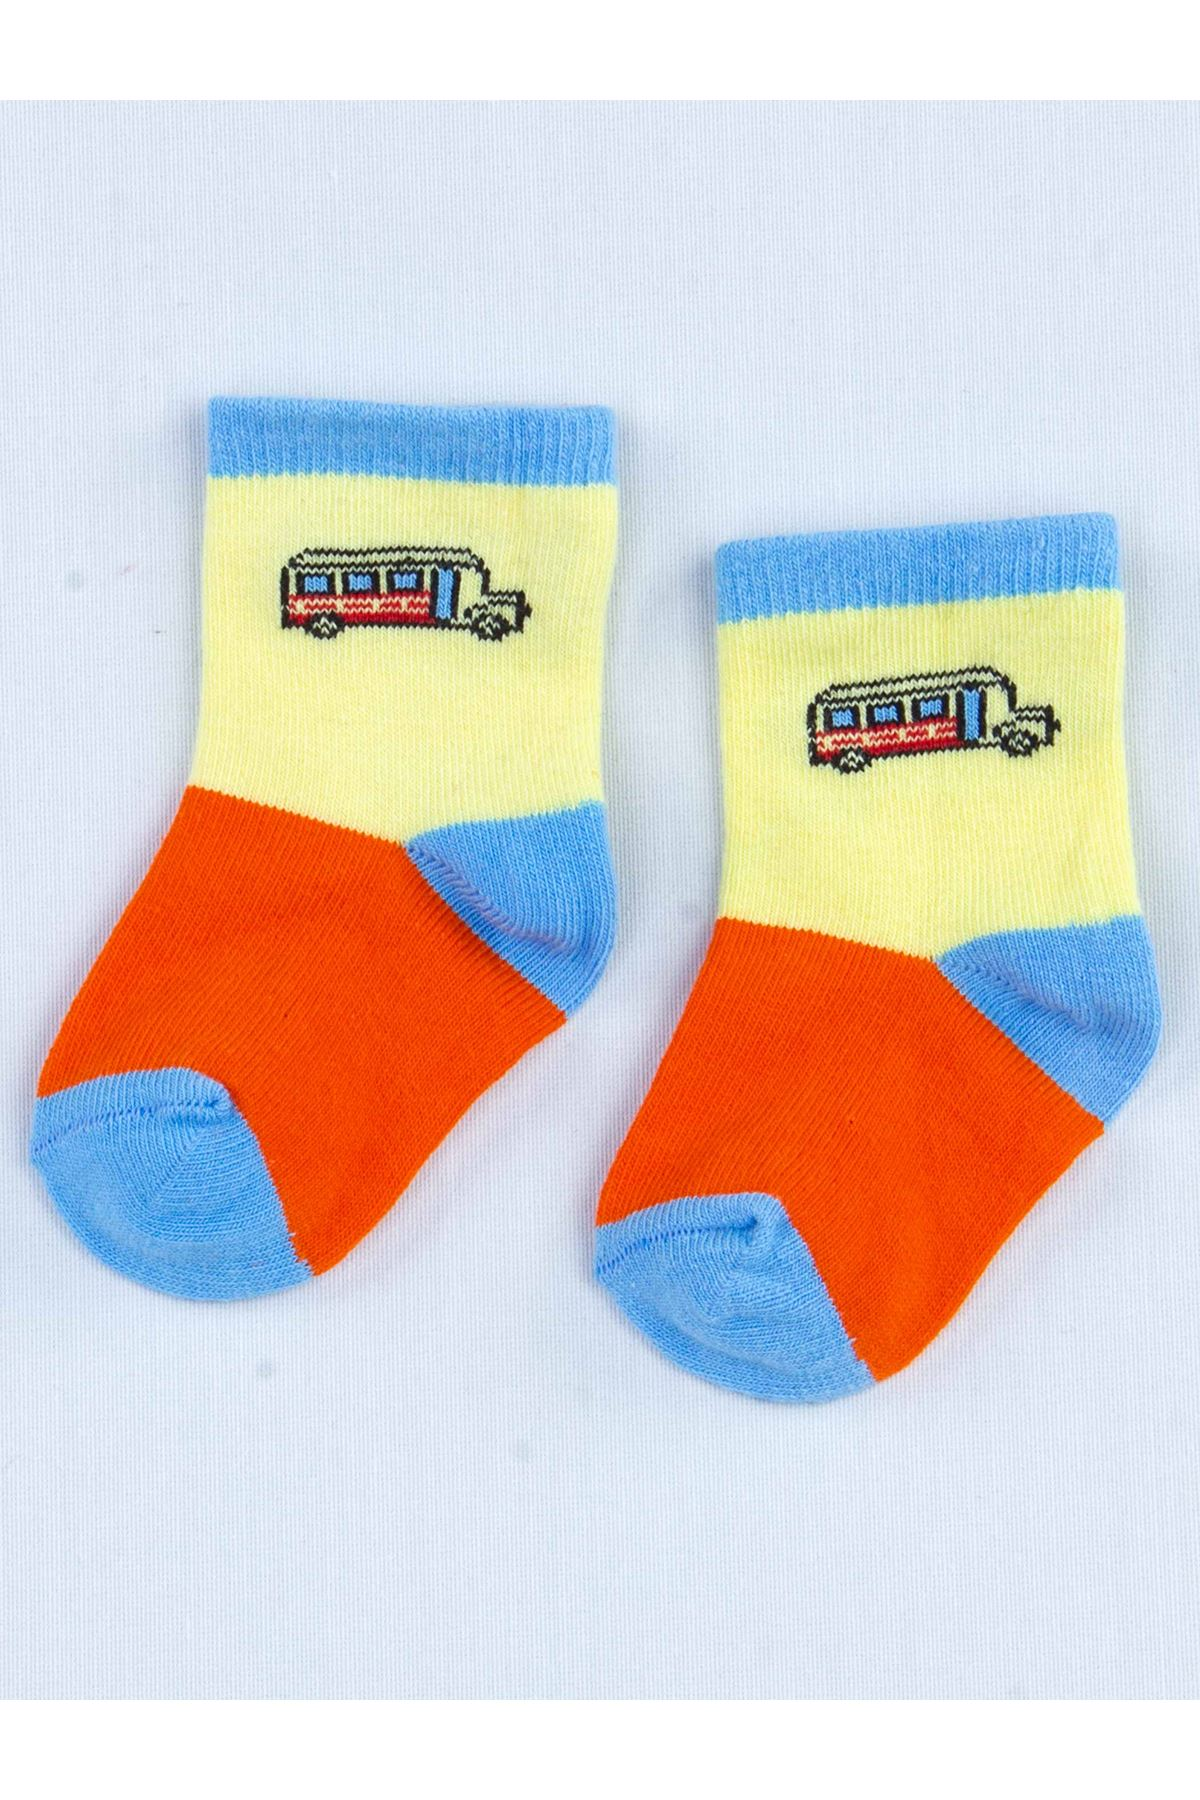 Orange Scented Baby Boy 2 Pieces Socks